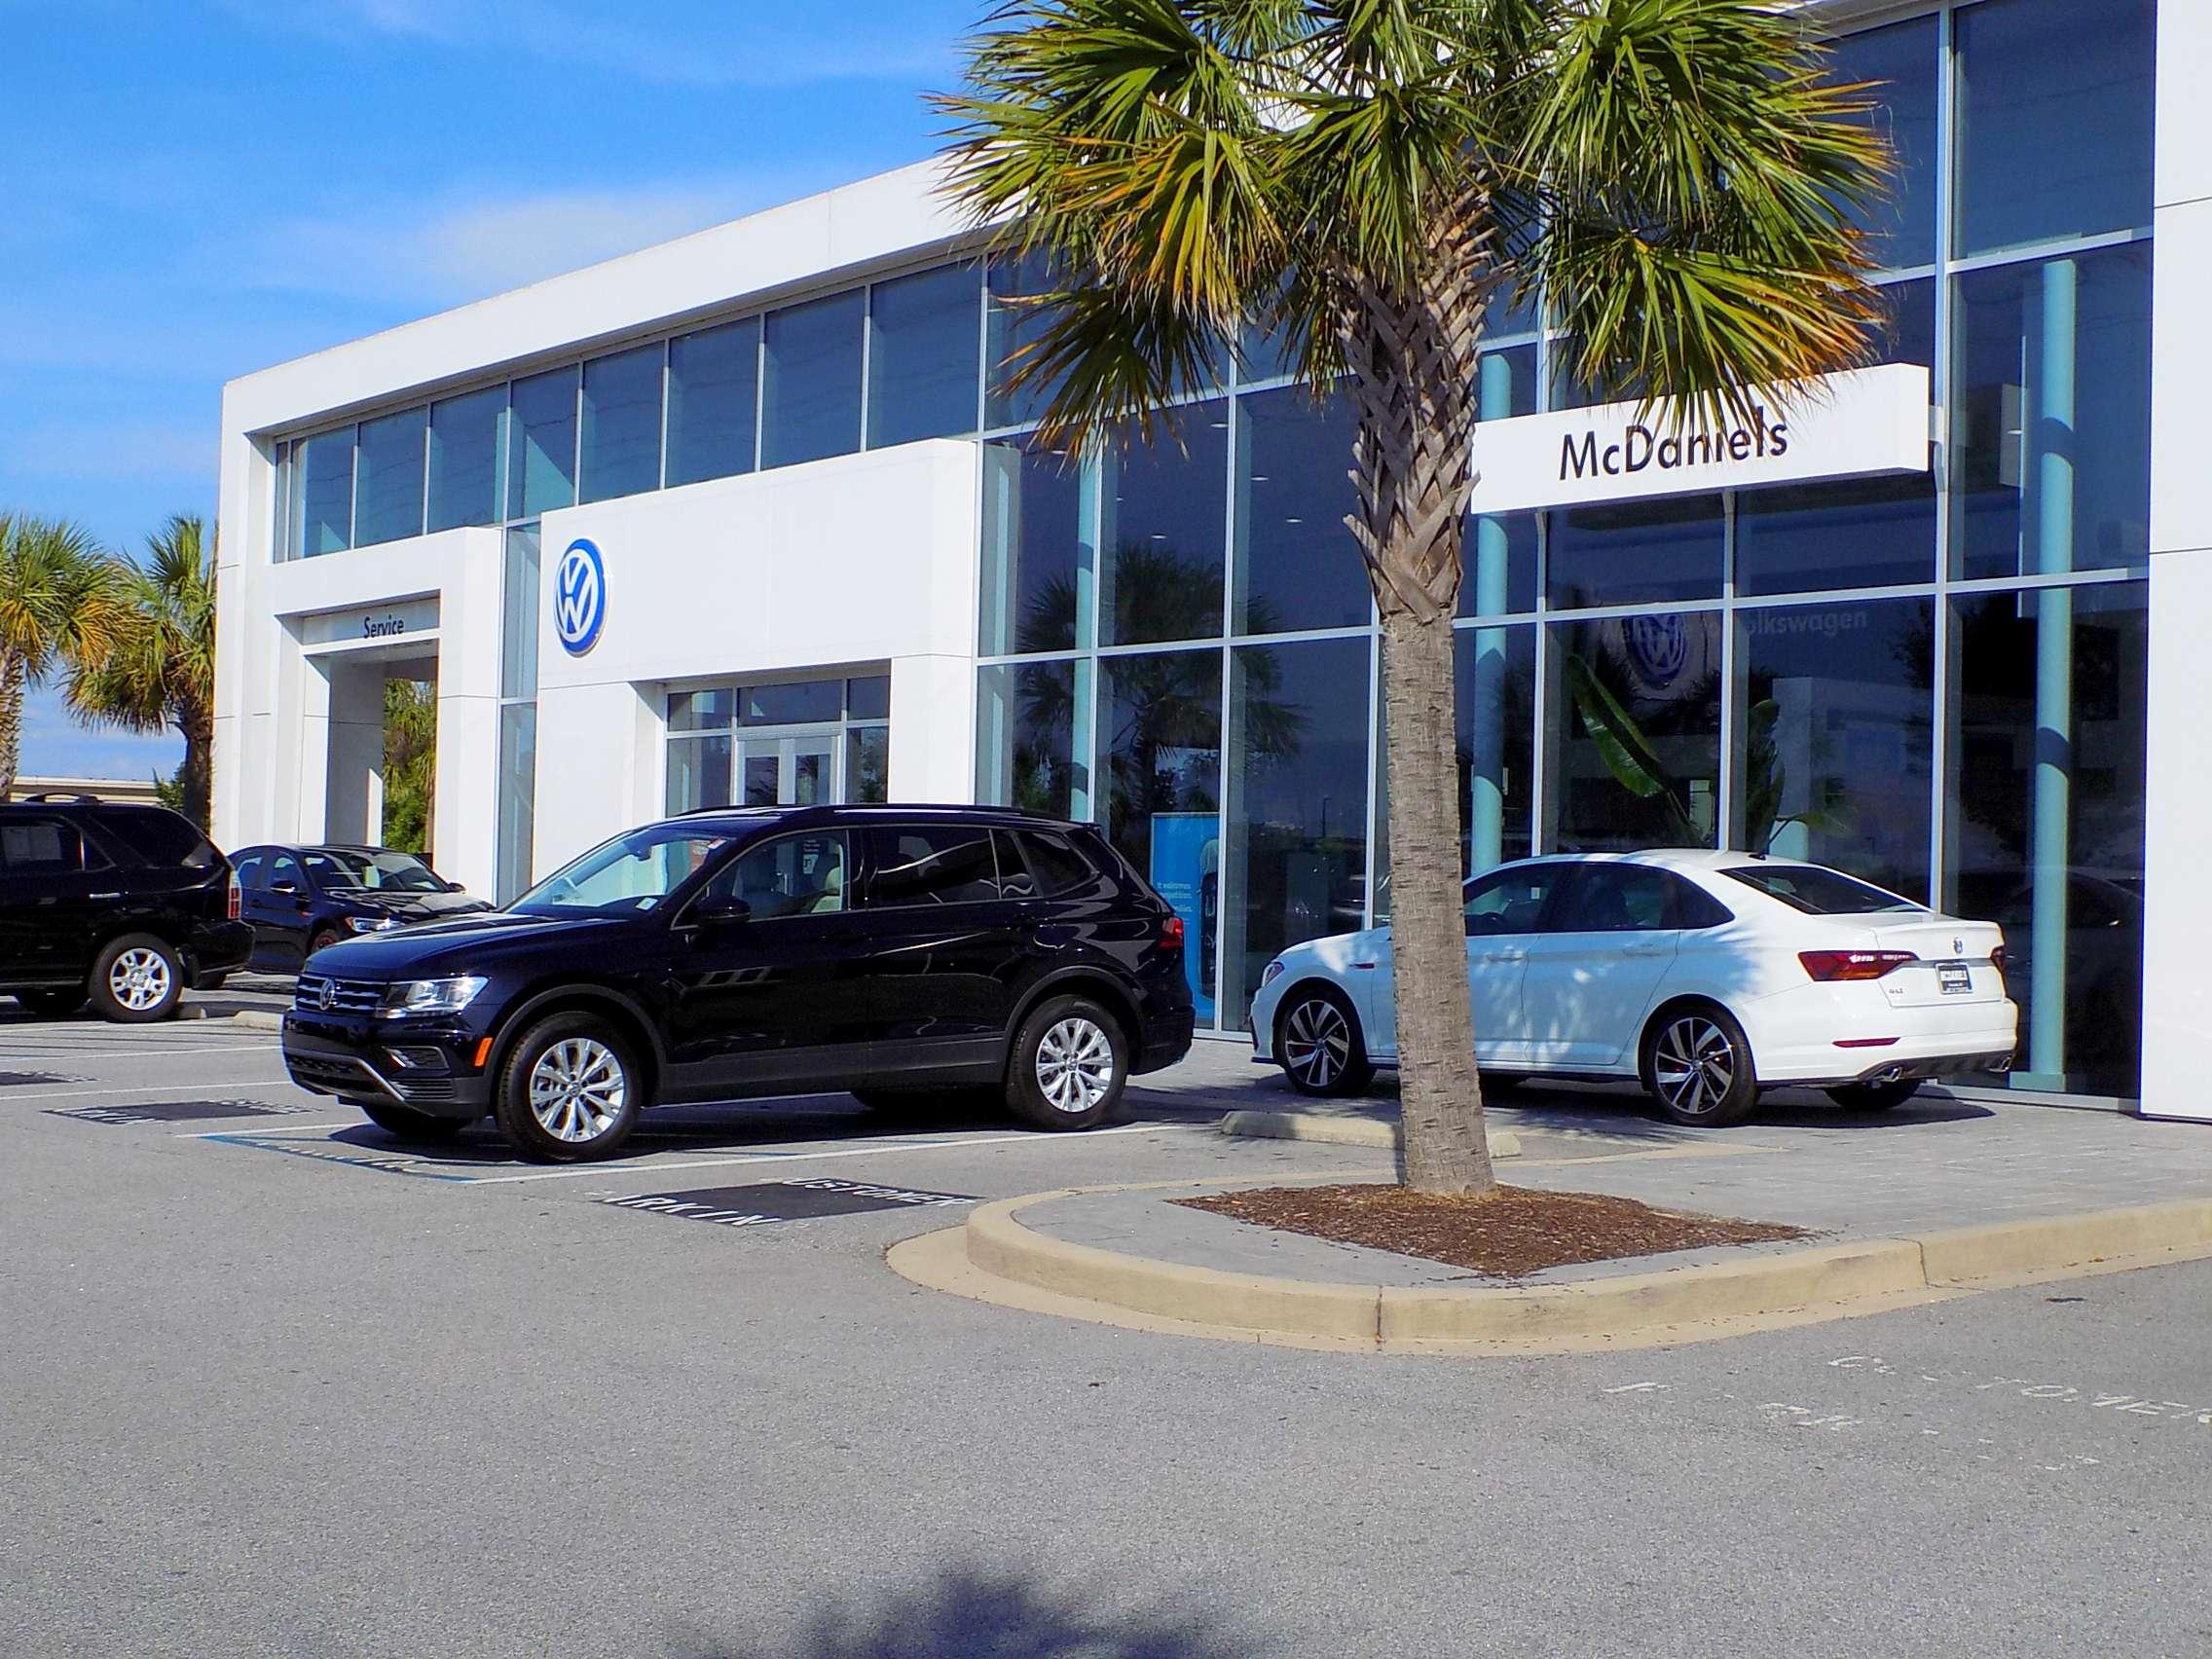 Volkswagen Dealership in Columbia, SC | McDaniels VW | New used VW cars